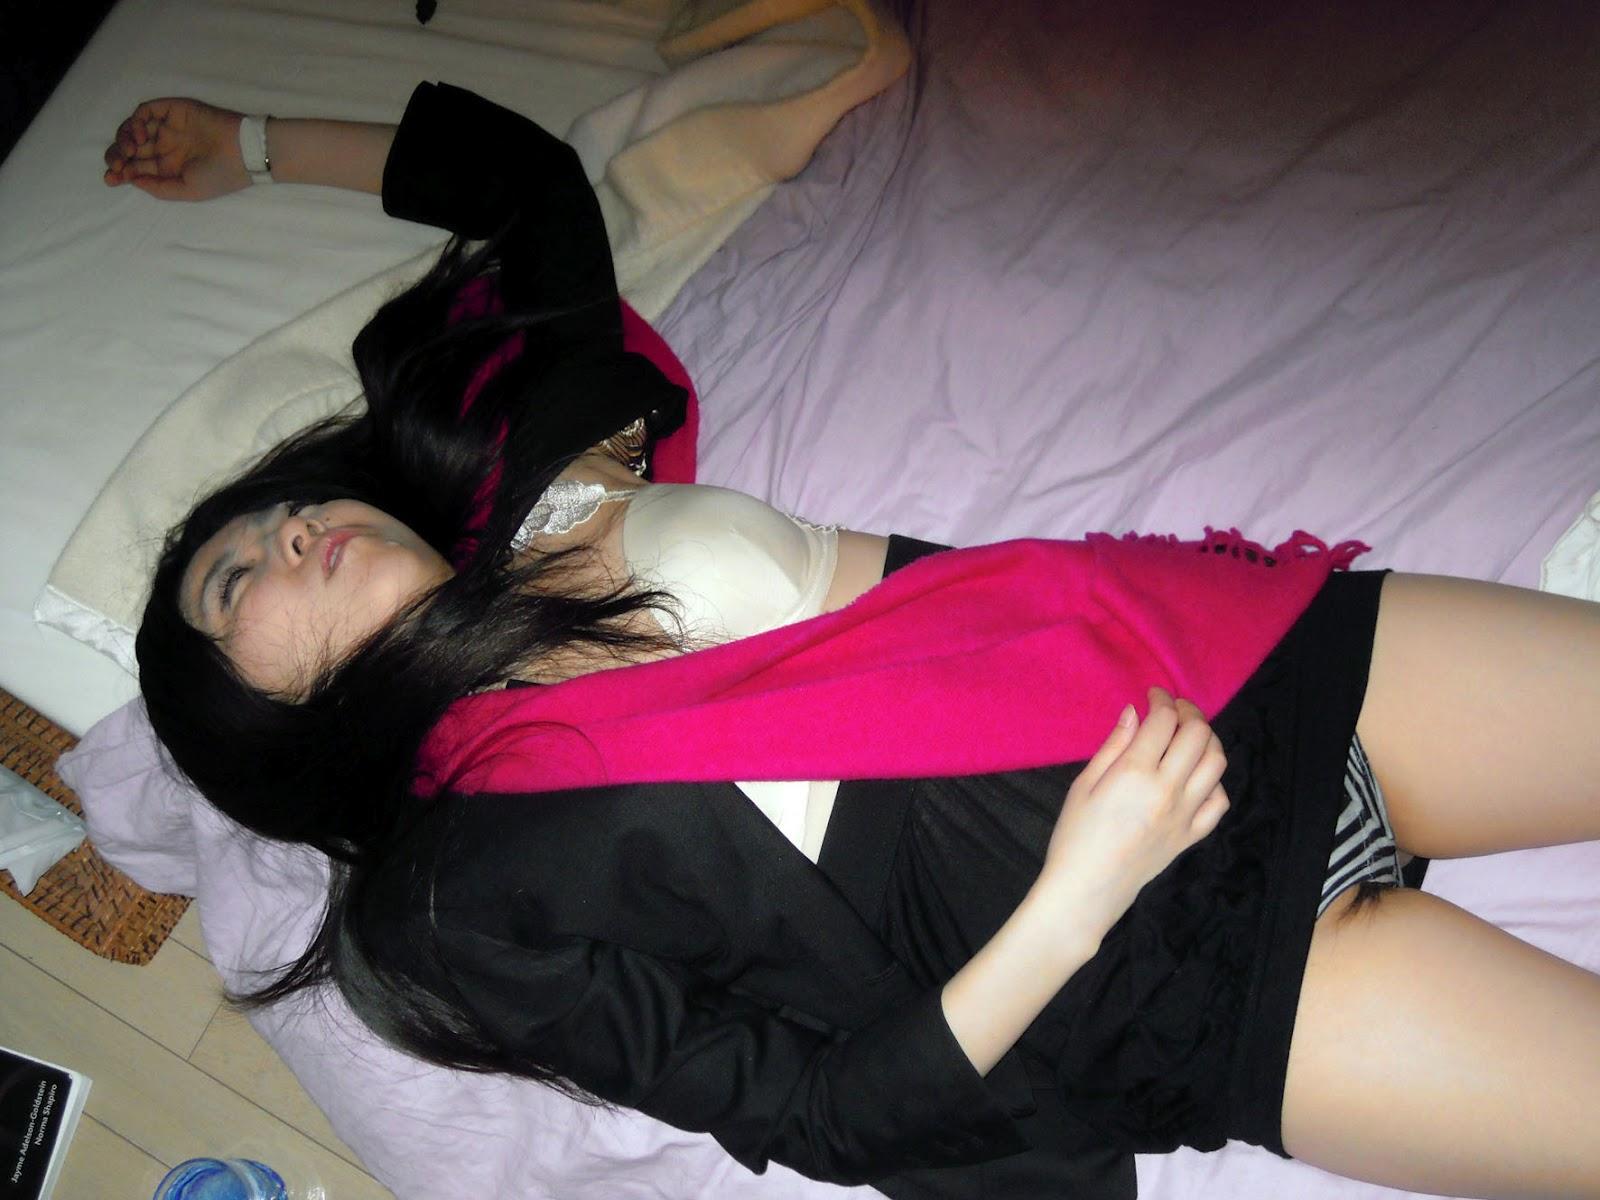 Japan drunk girl